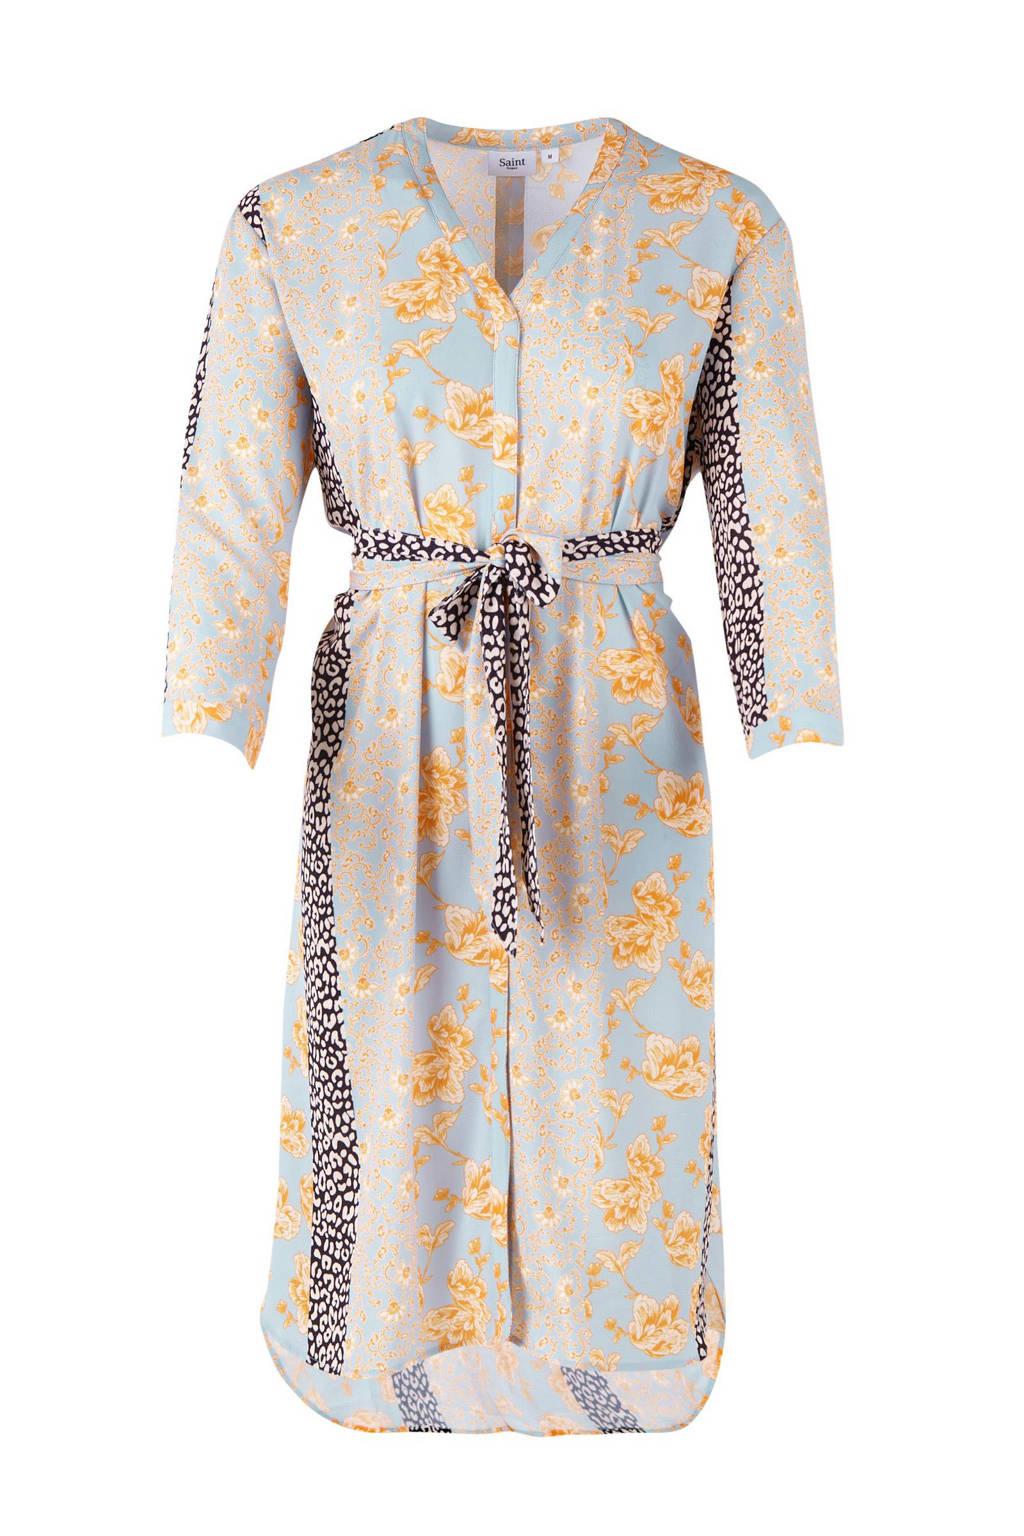 Saint Tropez jurk met bloemenprint, Lichtblauw/roze